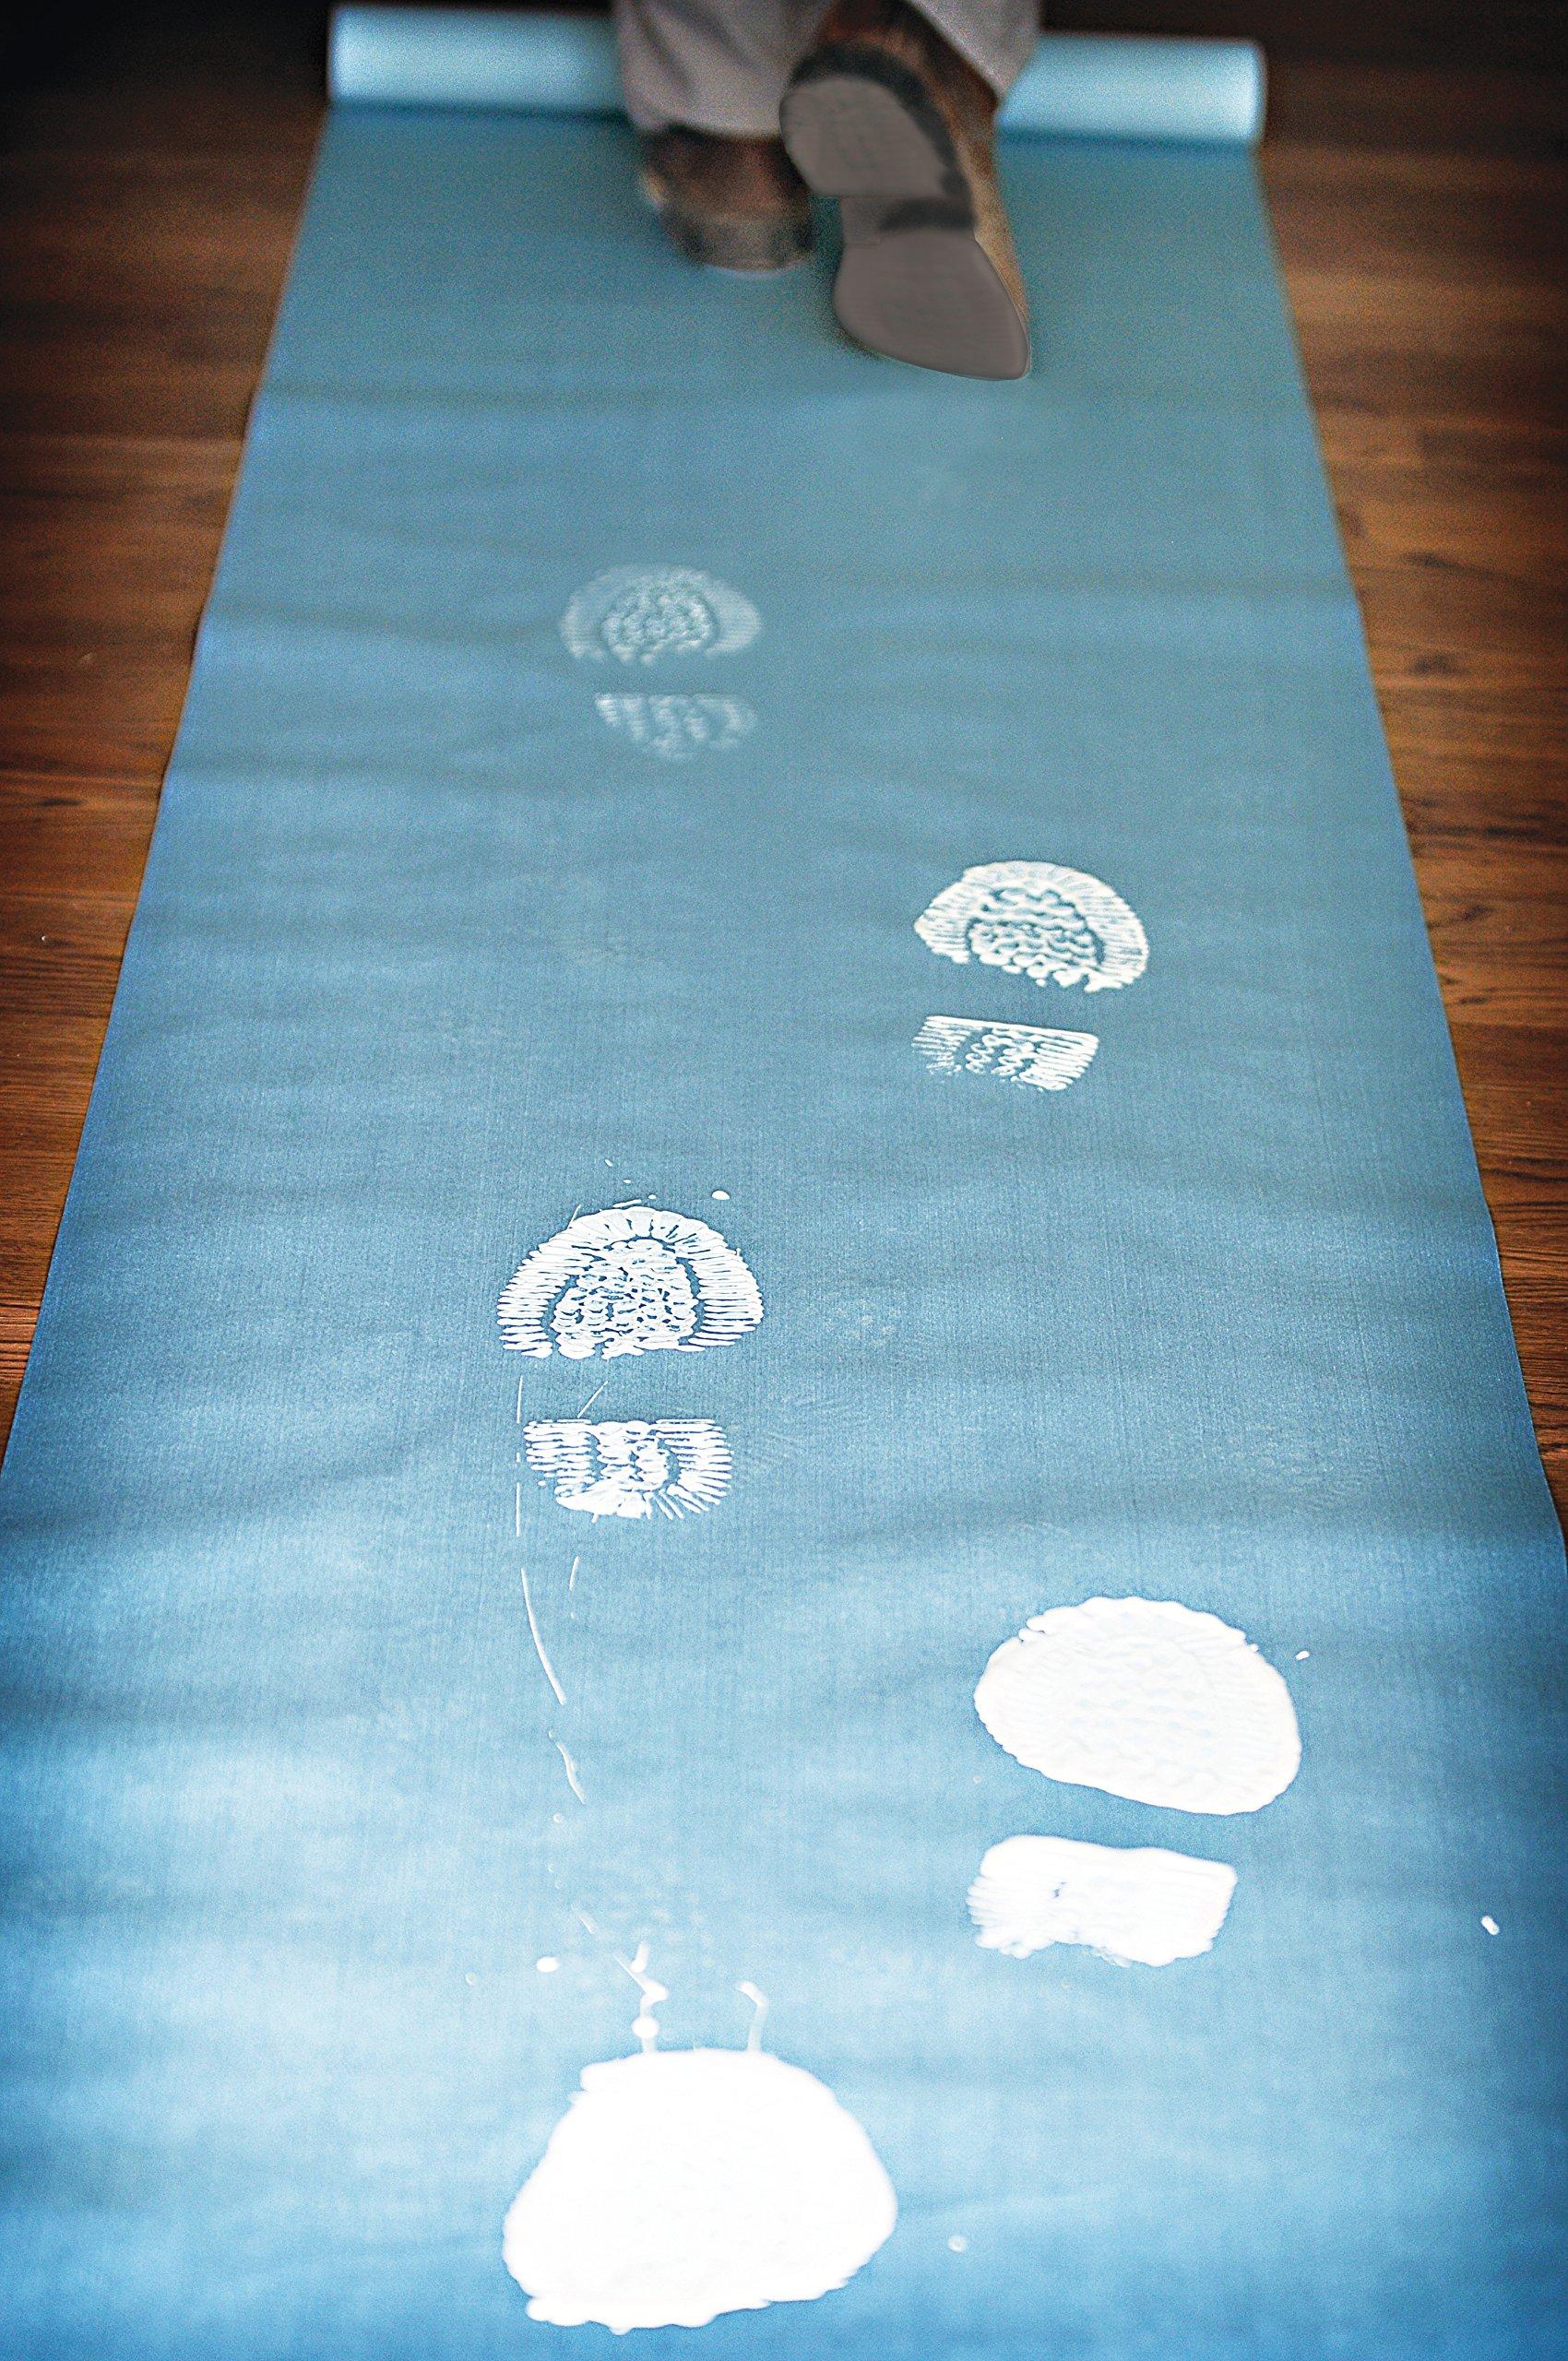 Trimaco One Tuff Floor Protector Roll, 24-inch x 100-feet